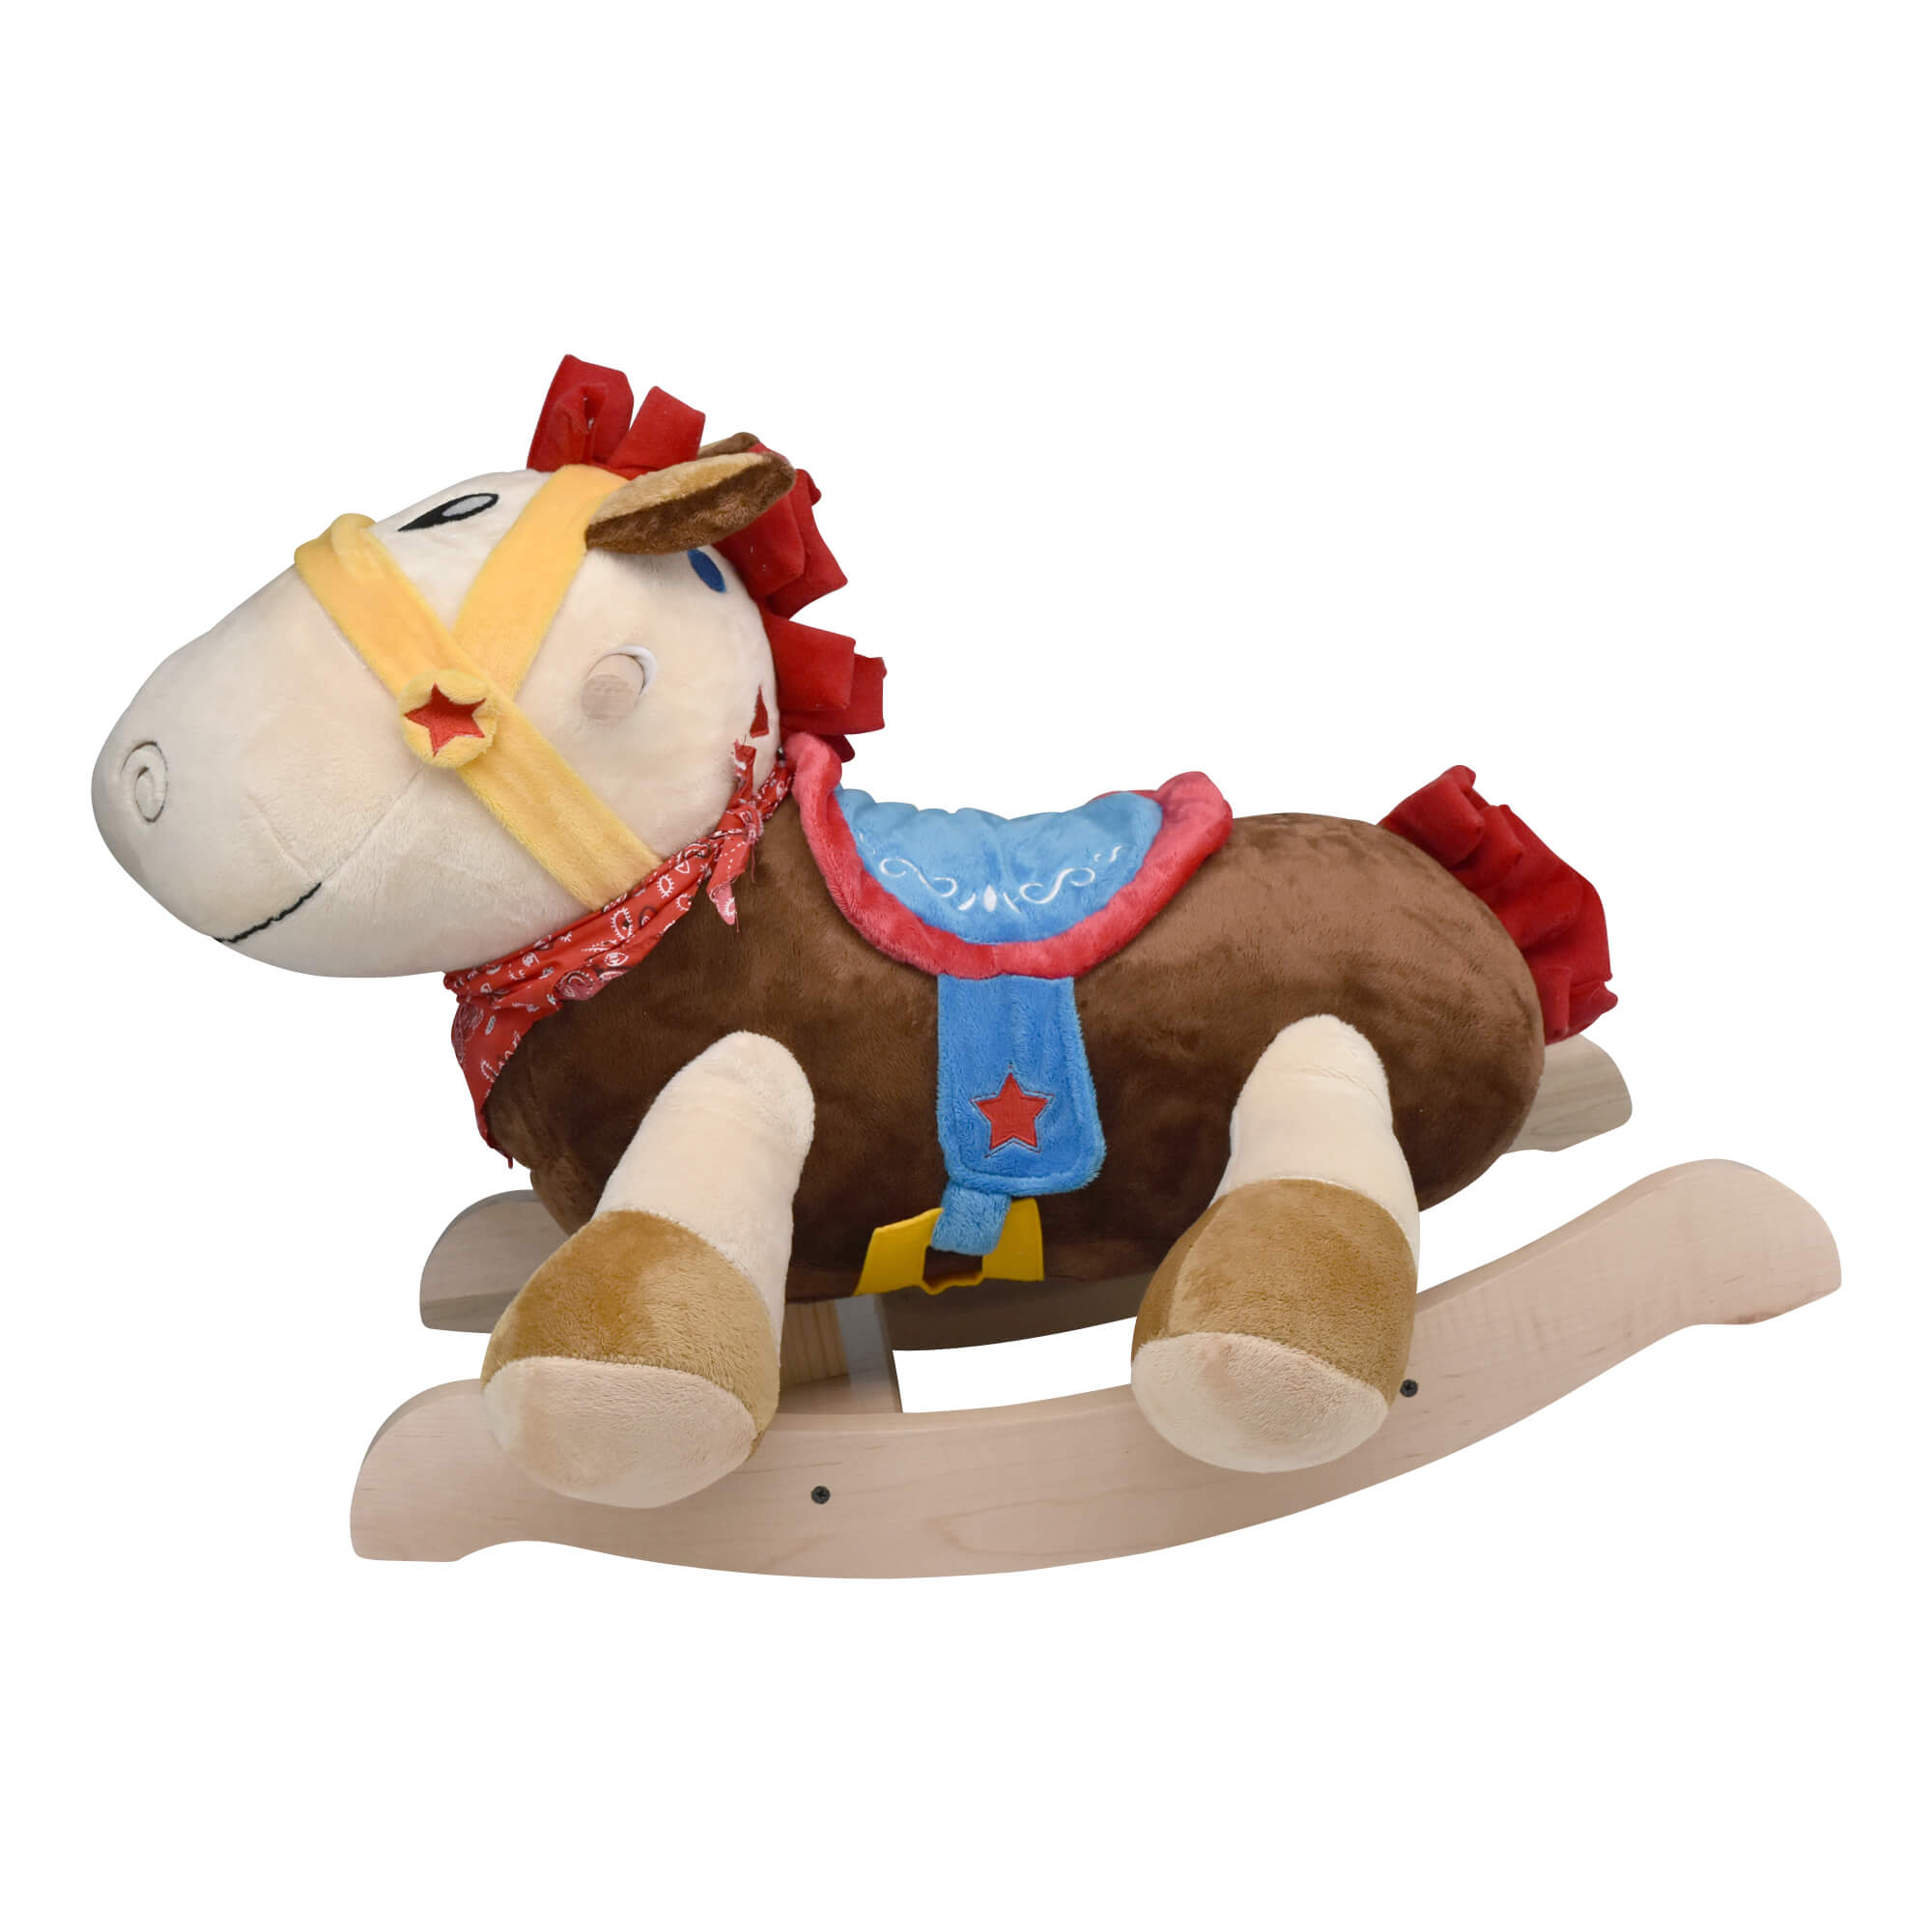 Colt Horse Baby Rocker - JL Ryan